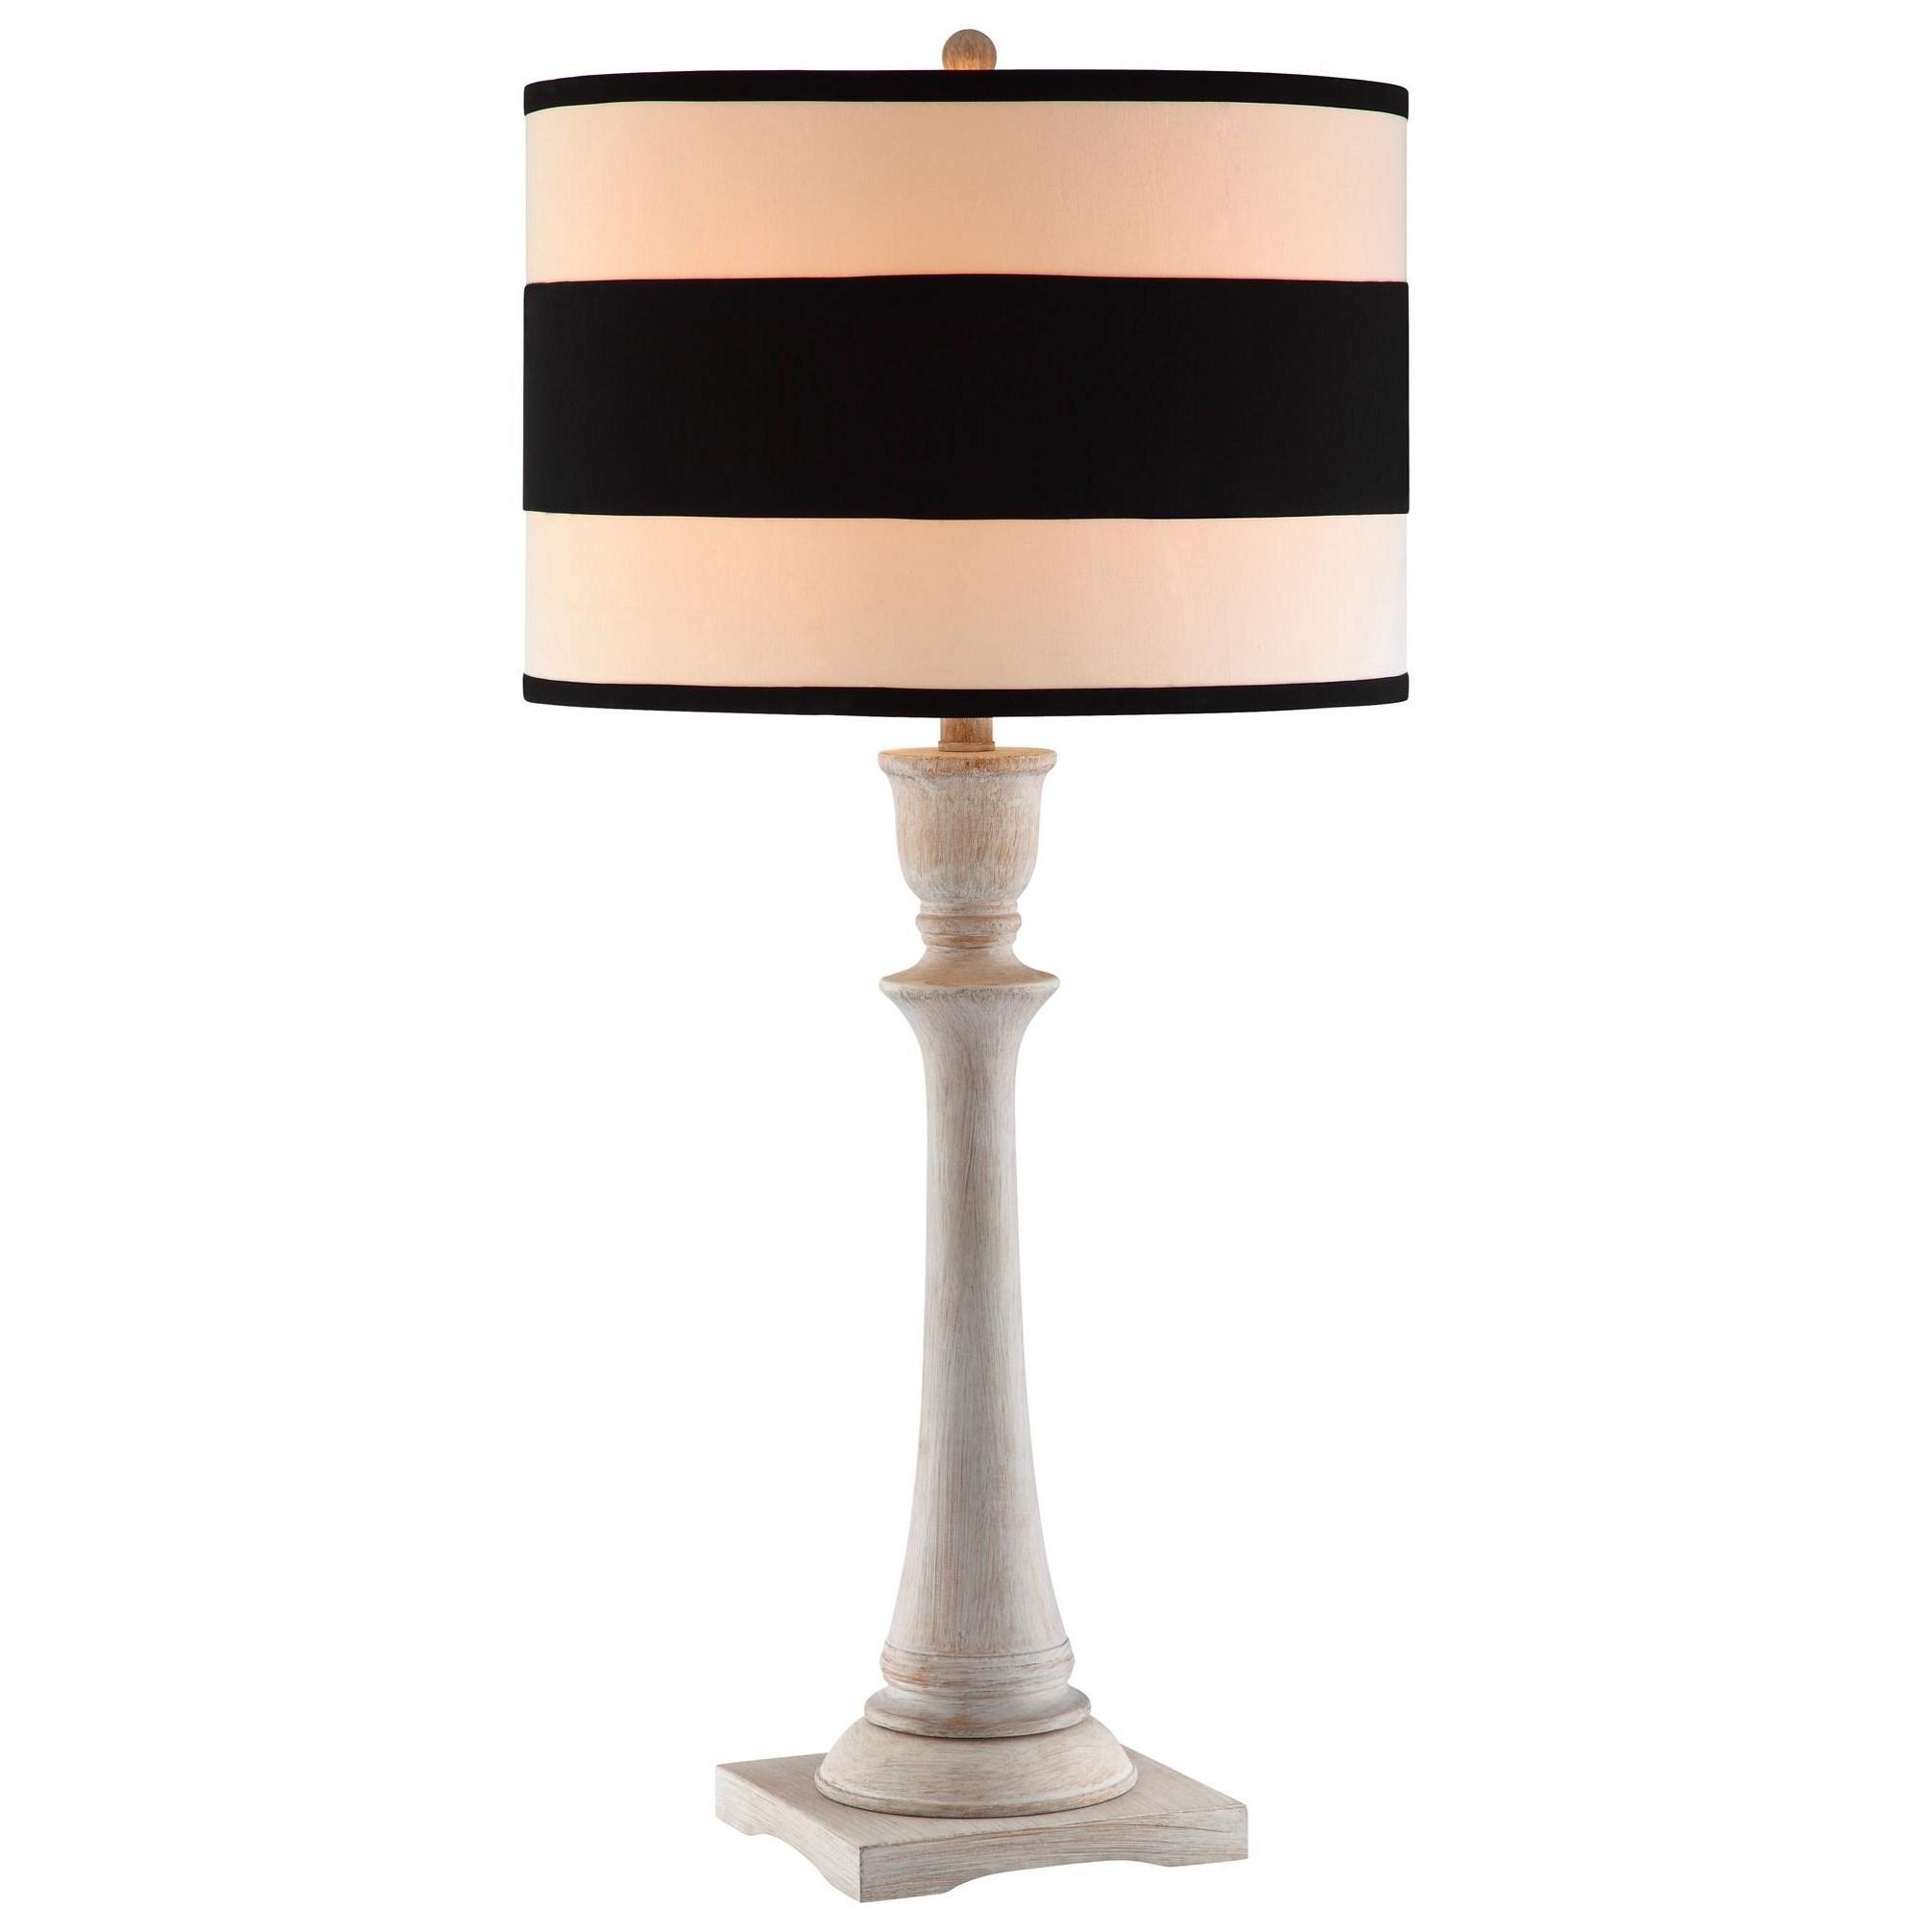 Stein World LampsTabatha Table Lamp ...